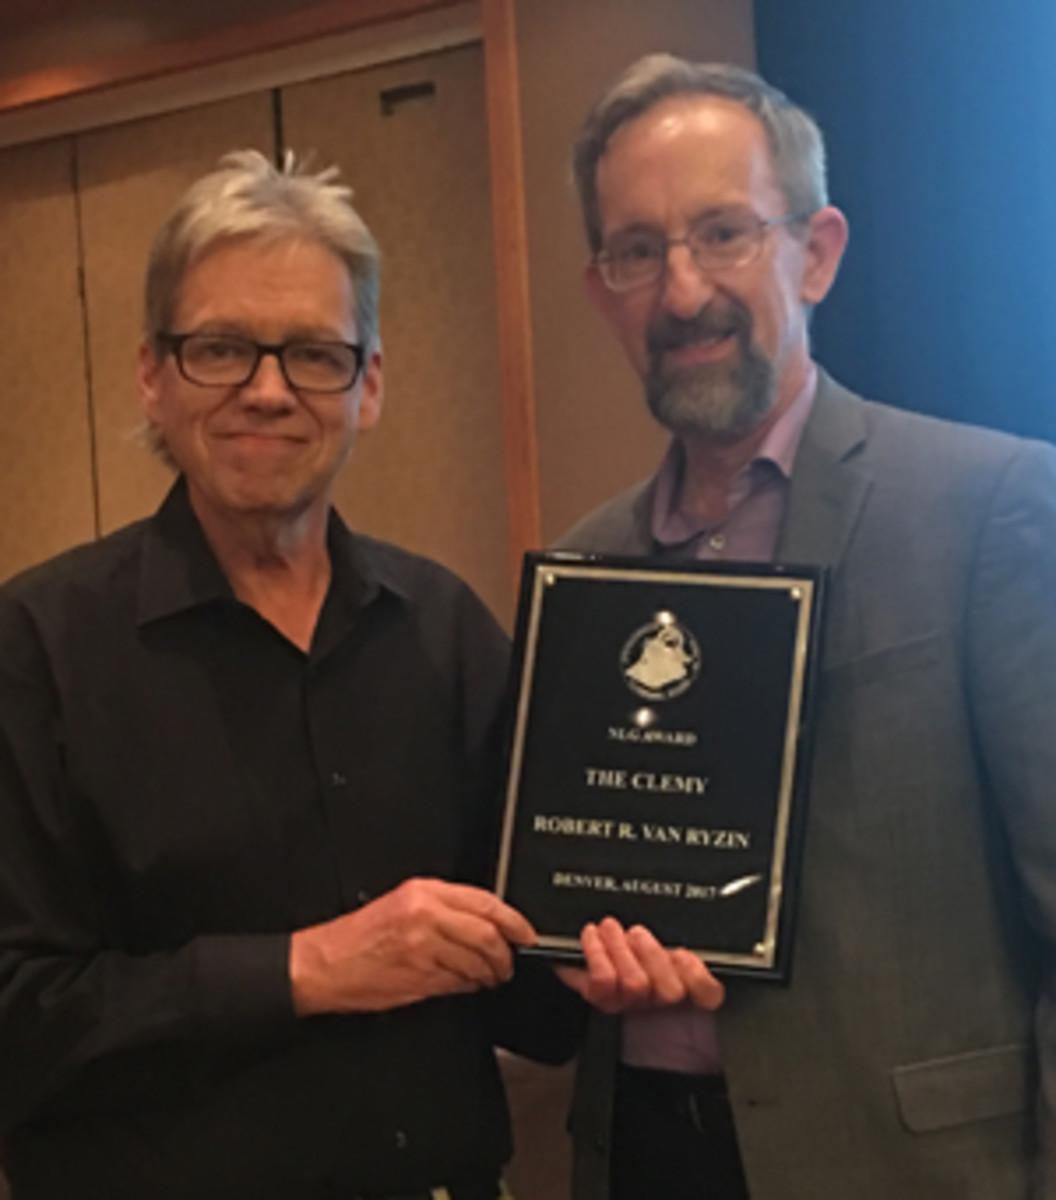 Robert R. Van Ryzin, left, receives the 2017 Clemy Award from 2016 recipient, Mark Borckardt, at the NLG Bash in Denver.